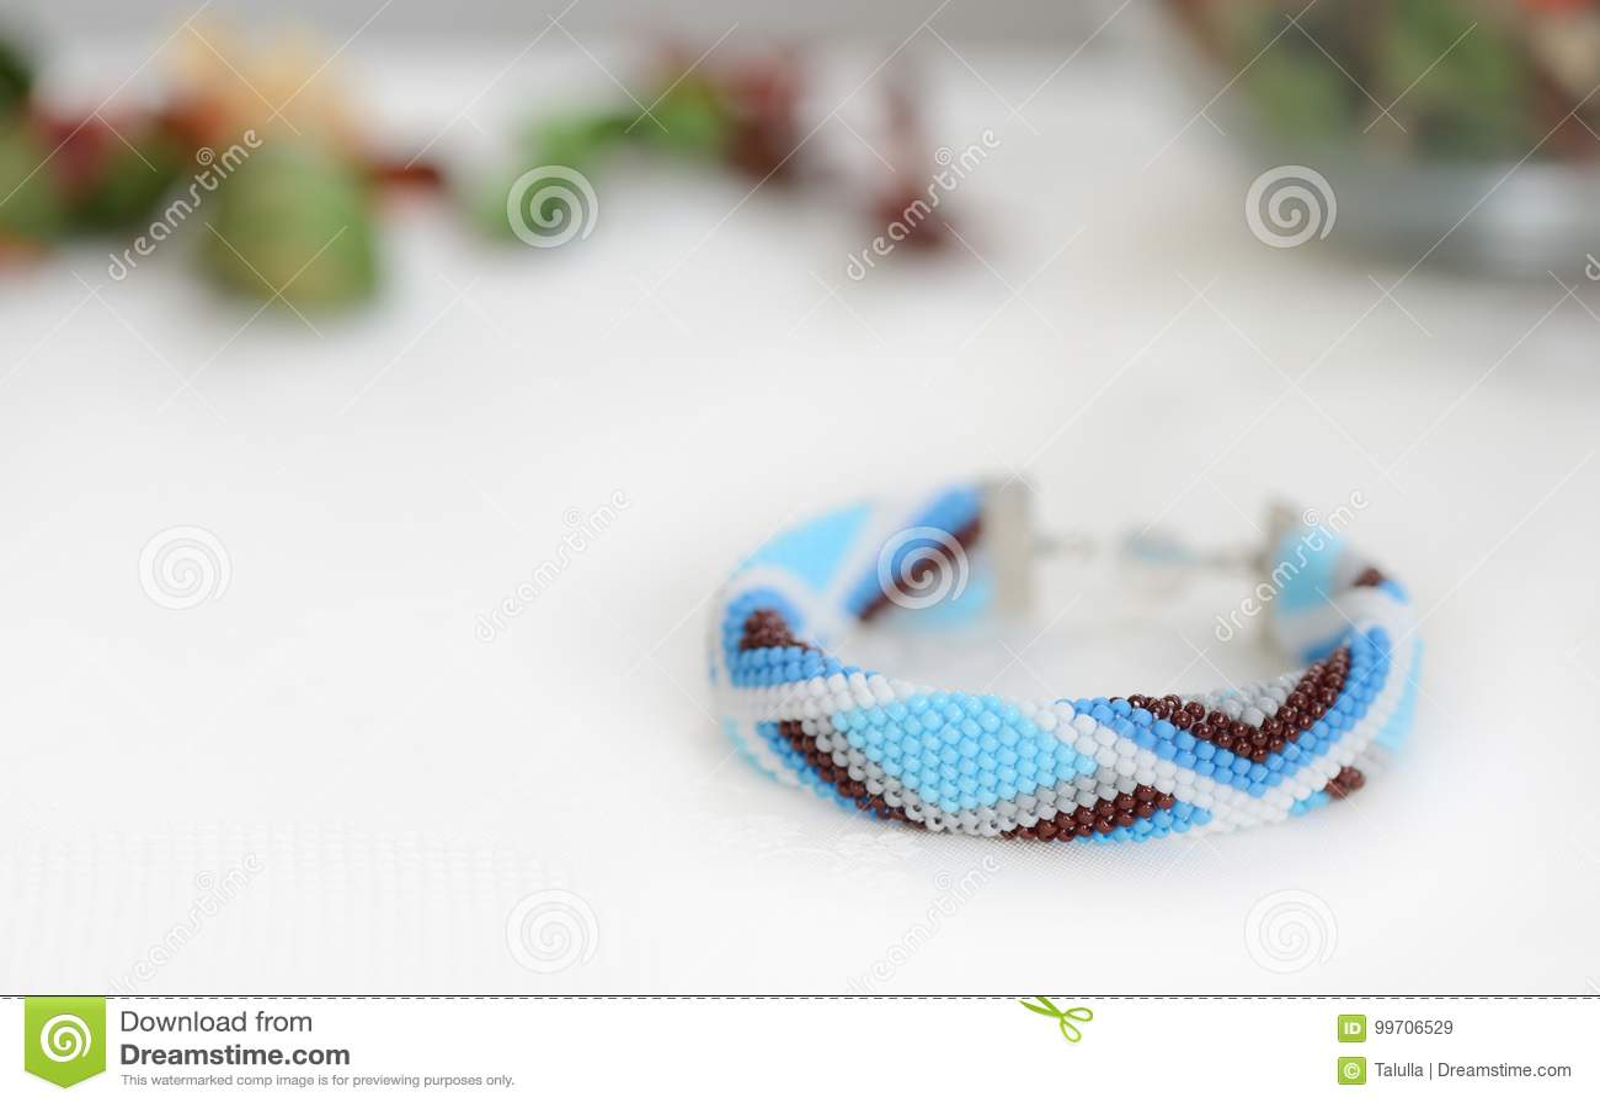 Blue Bead Crochet Bracelet With Geometrical Pattern Stock Image ...